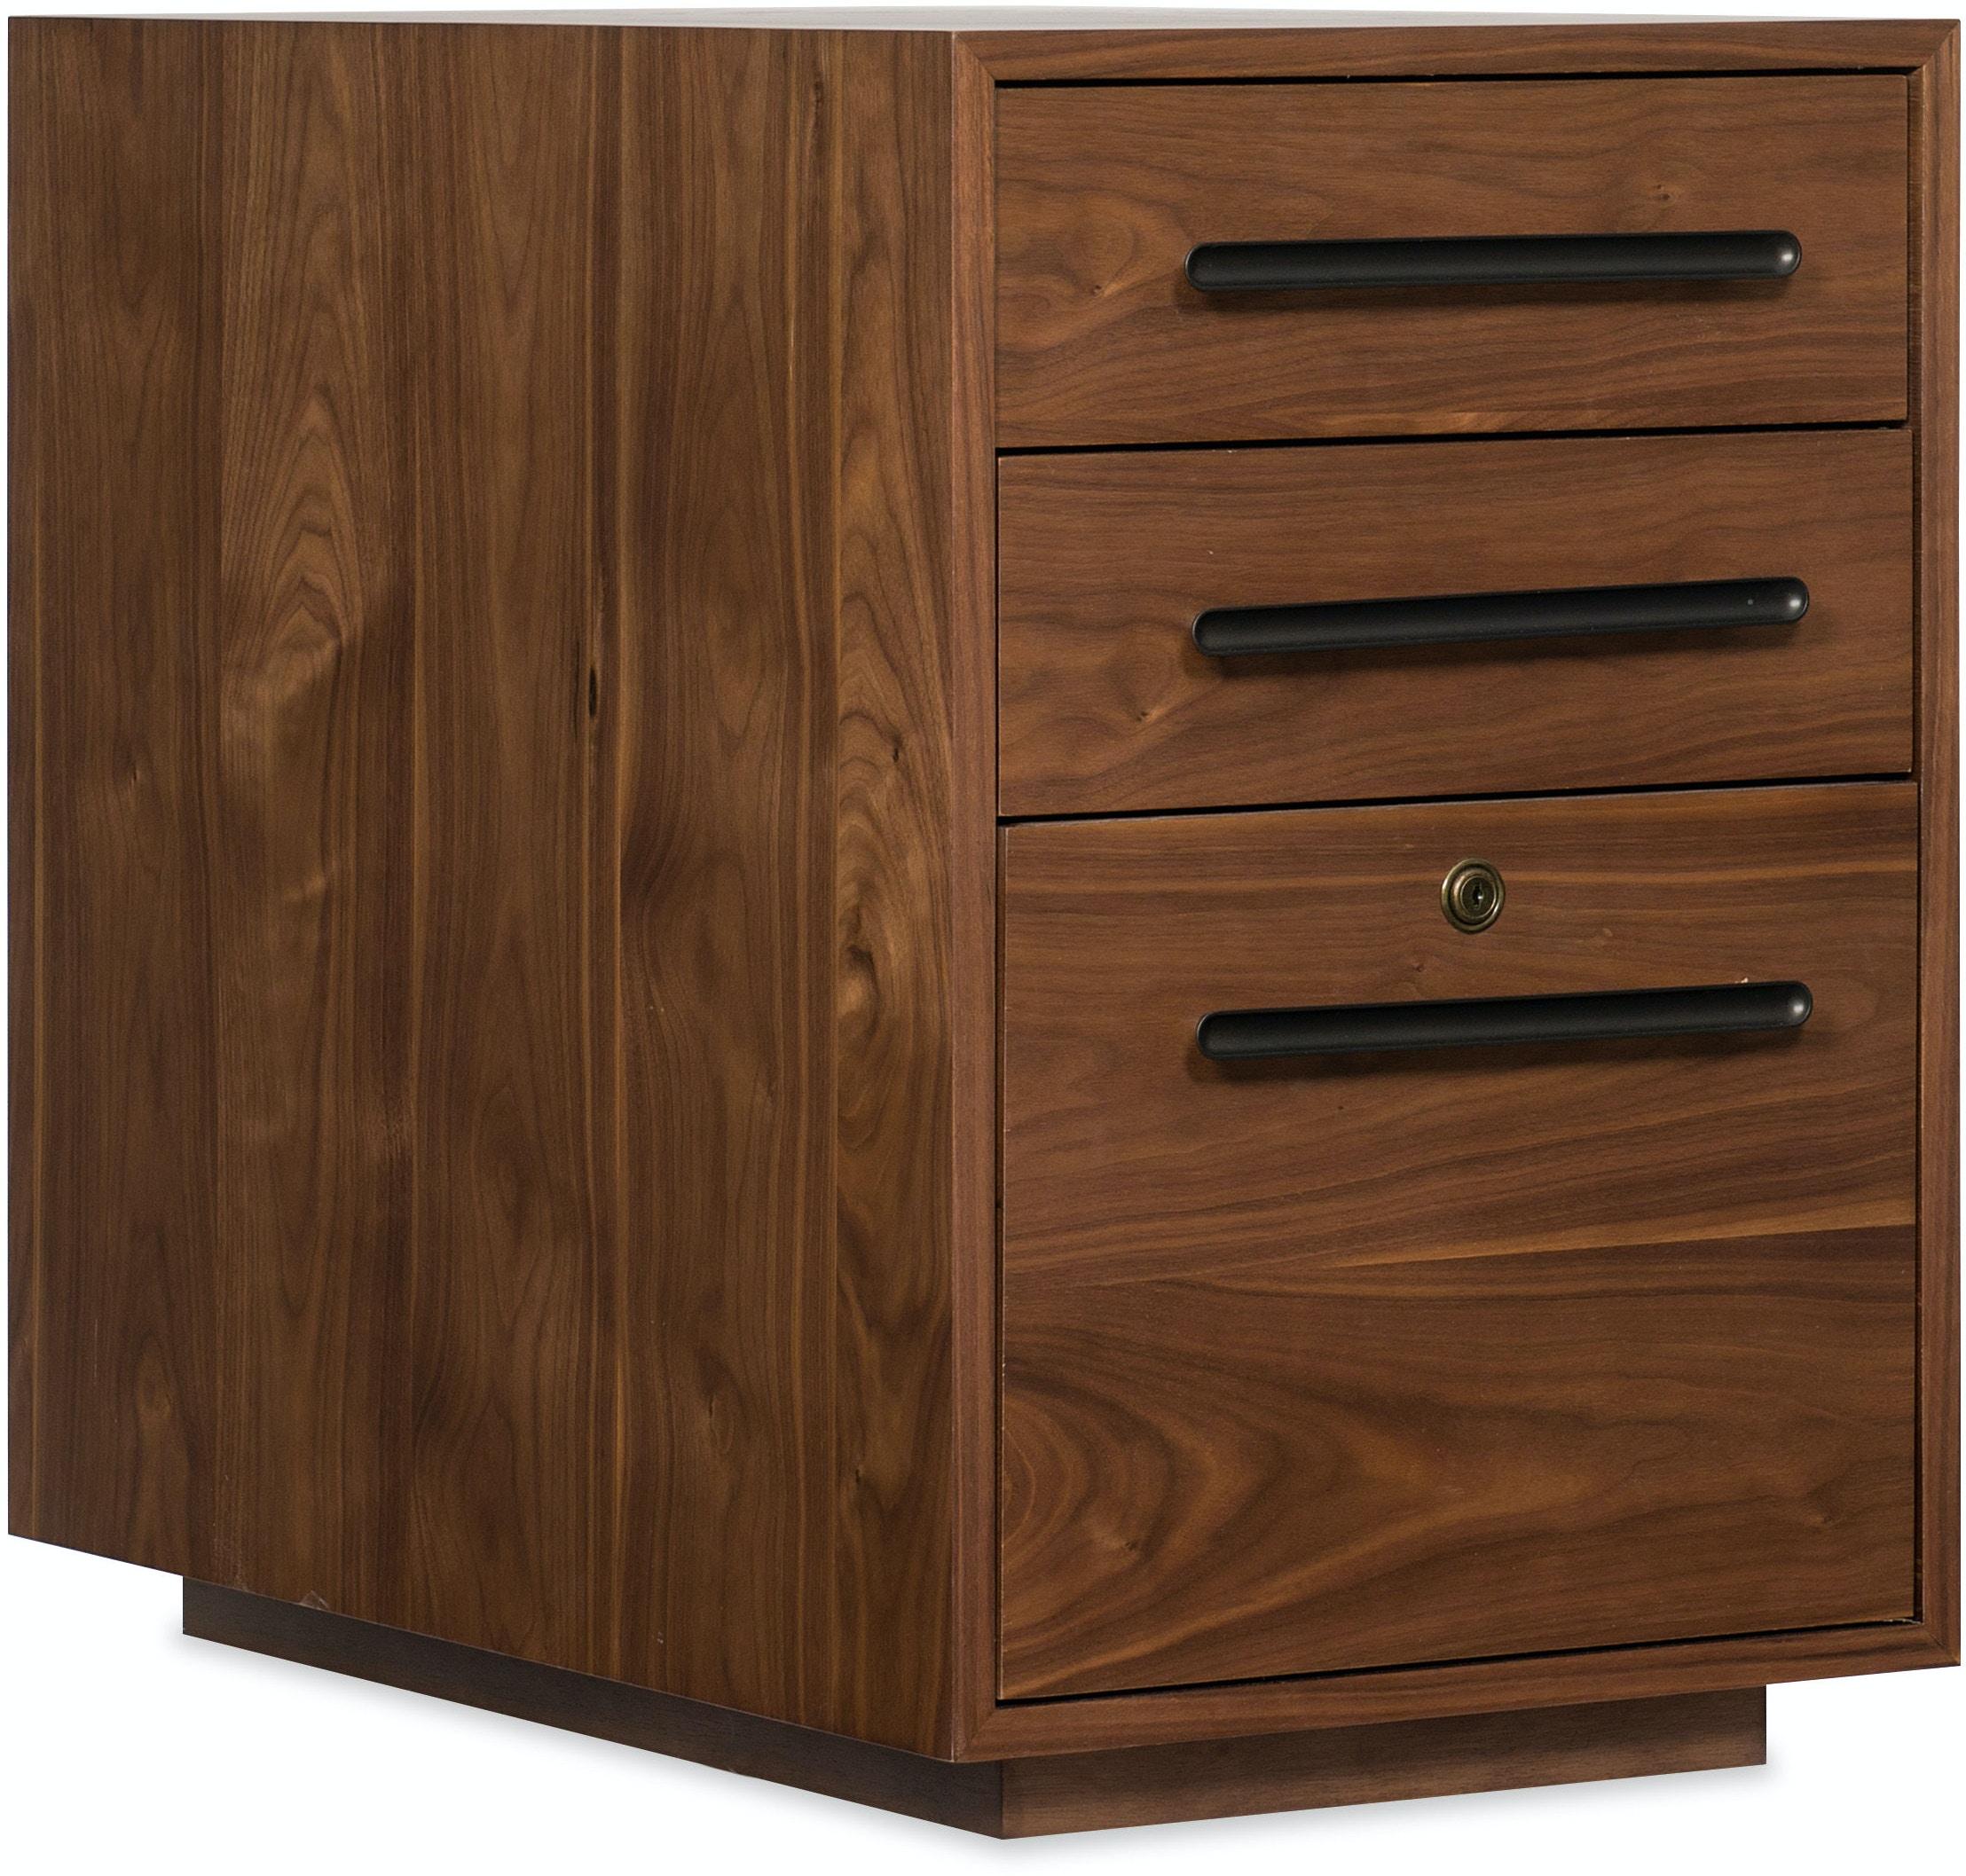 Hooker Furniture Home Office Elon Desk Pedestal 1650 10246